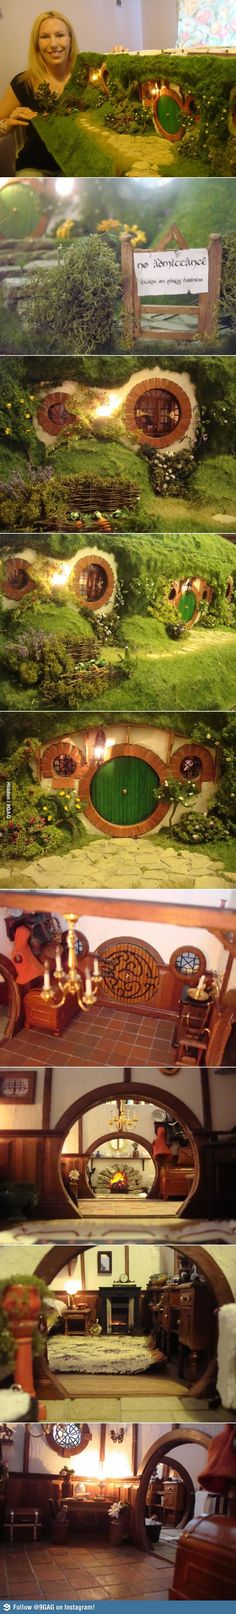 Awesome Hobbit Dollhouse!